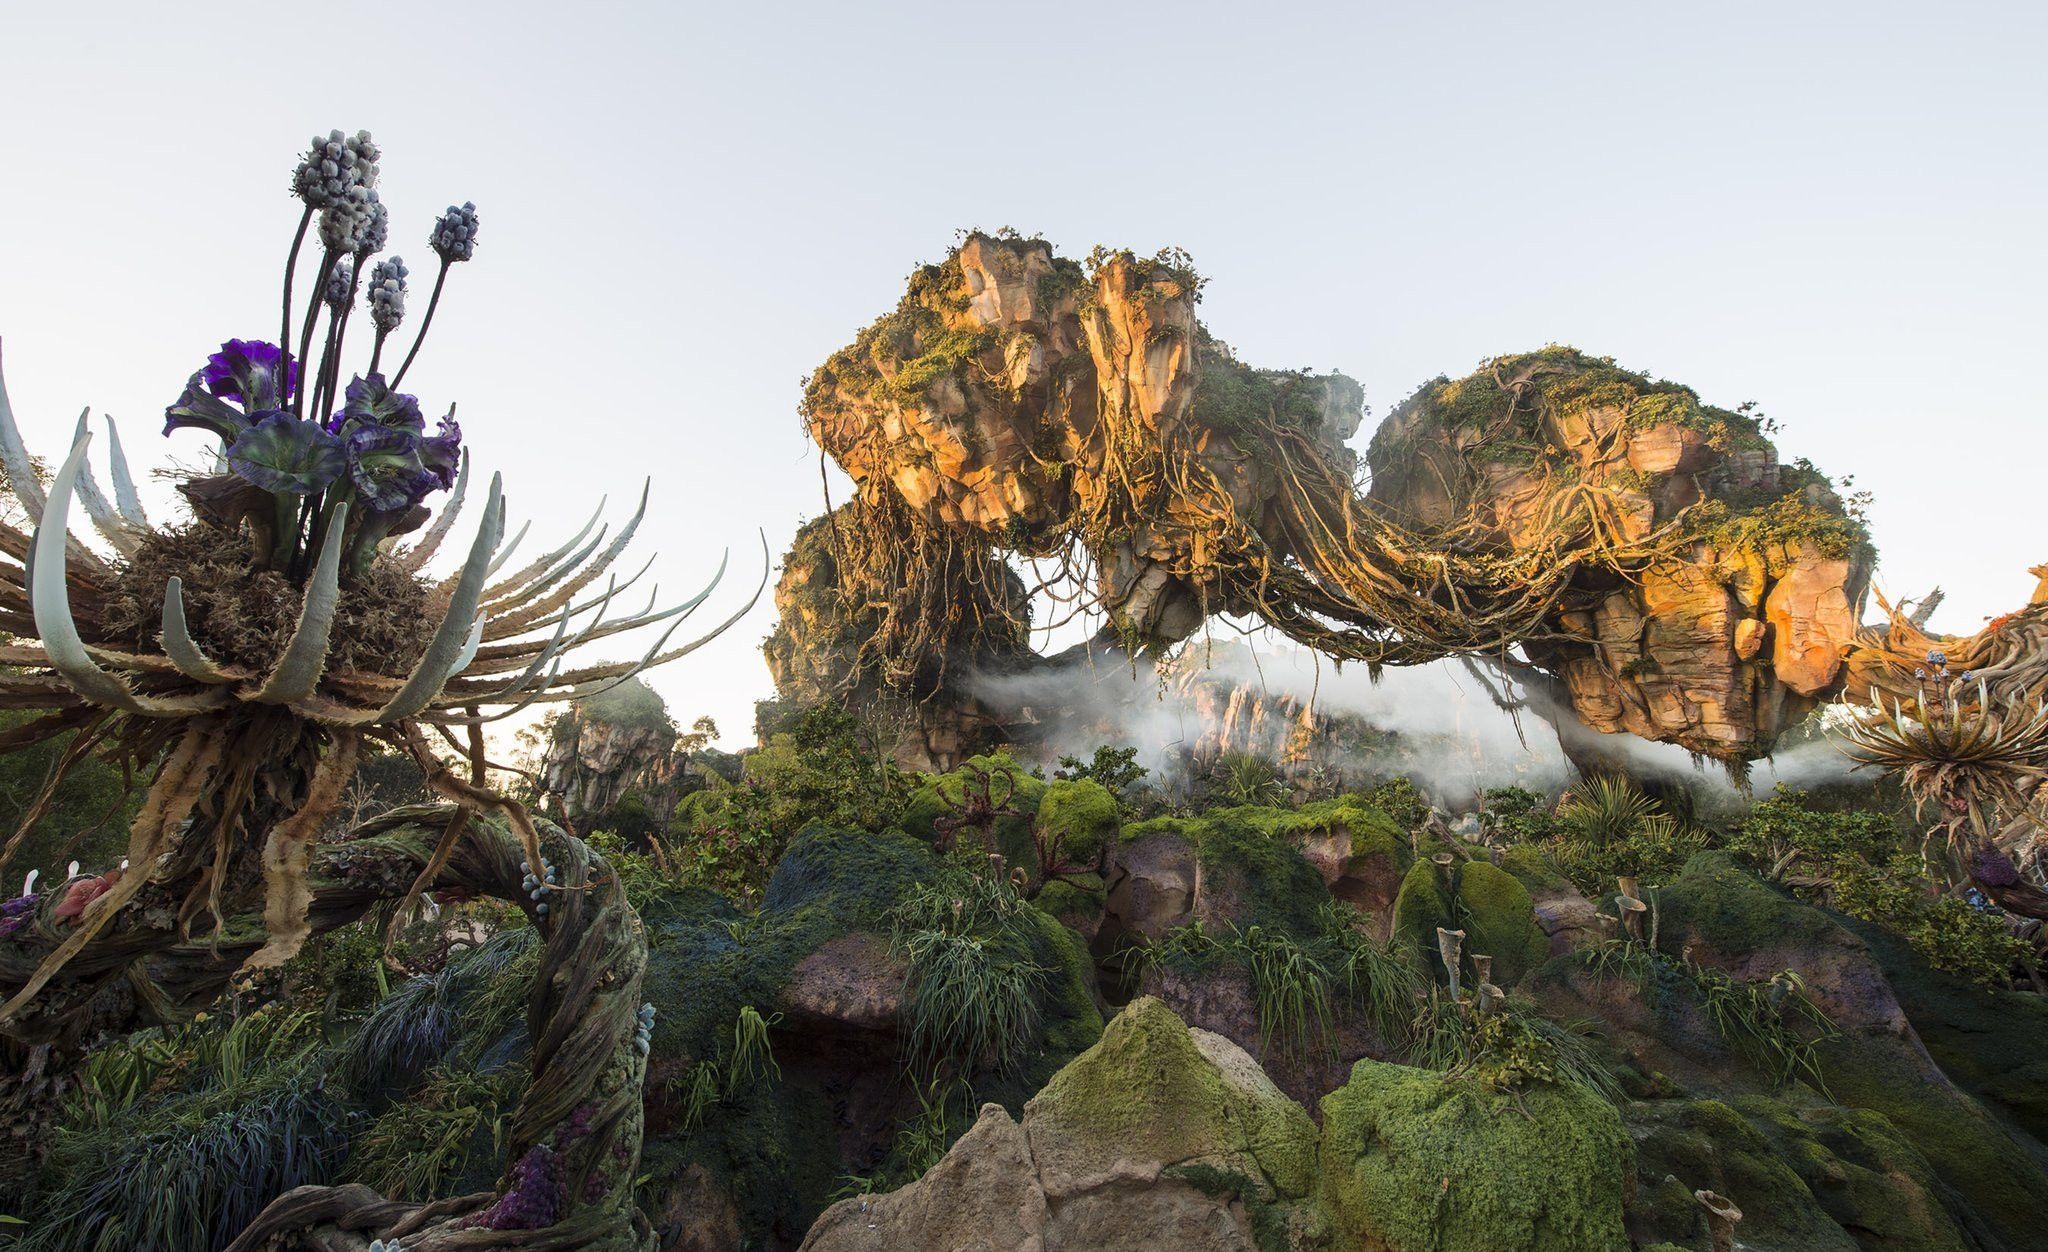 Secrets of Pandora World Of Avatar at Disney's Animal